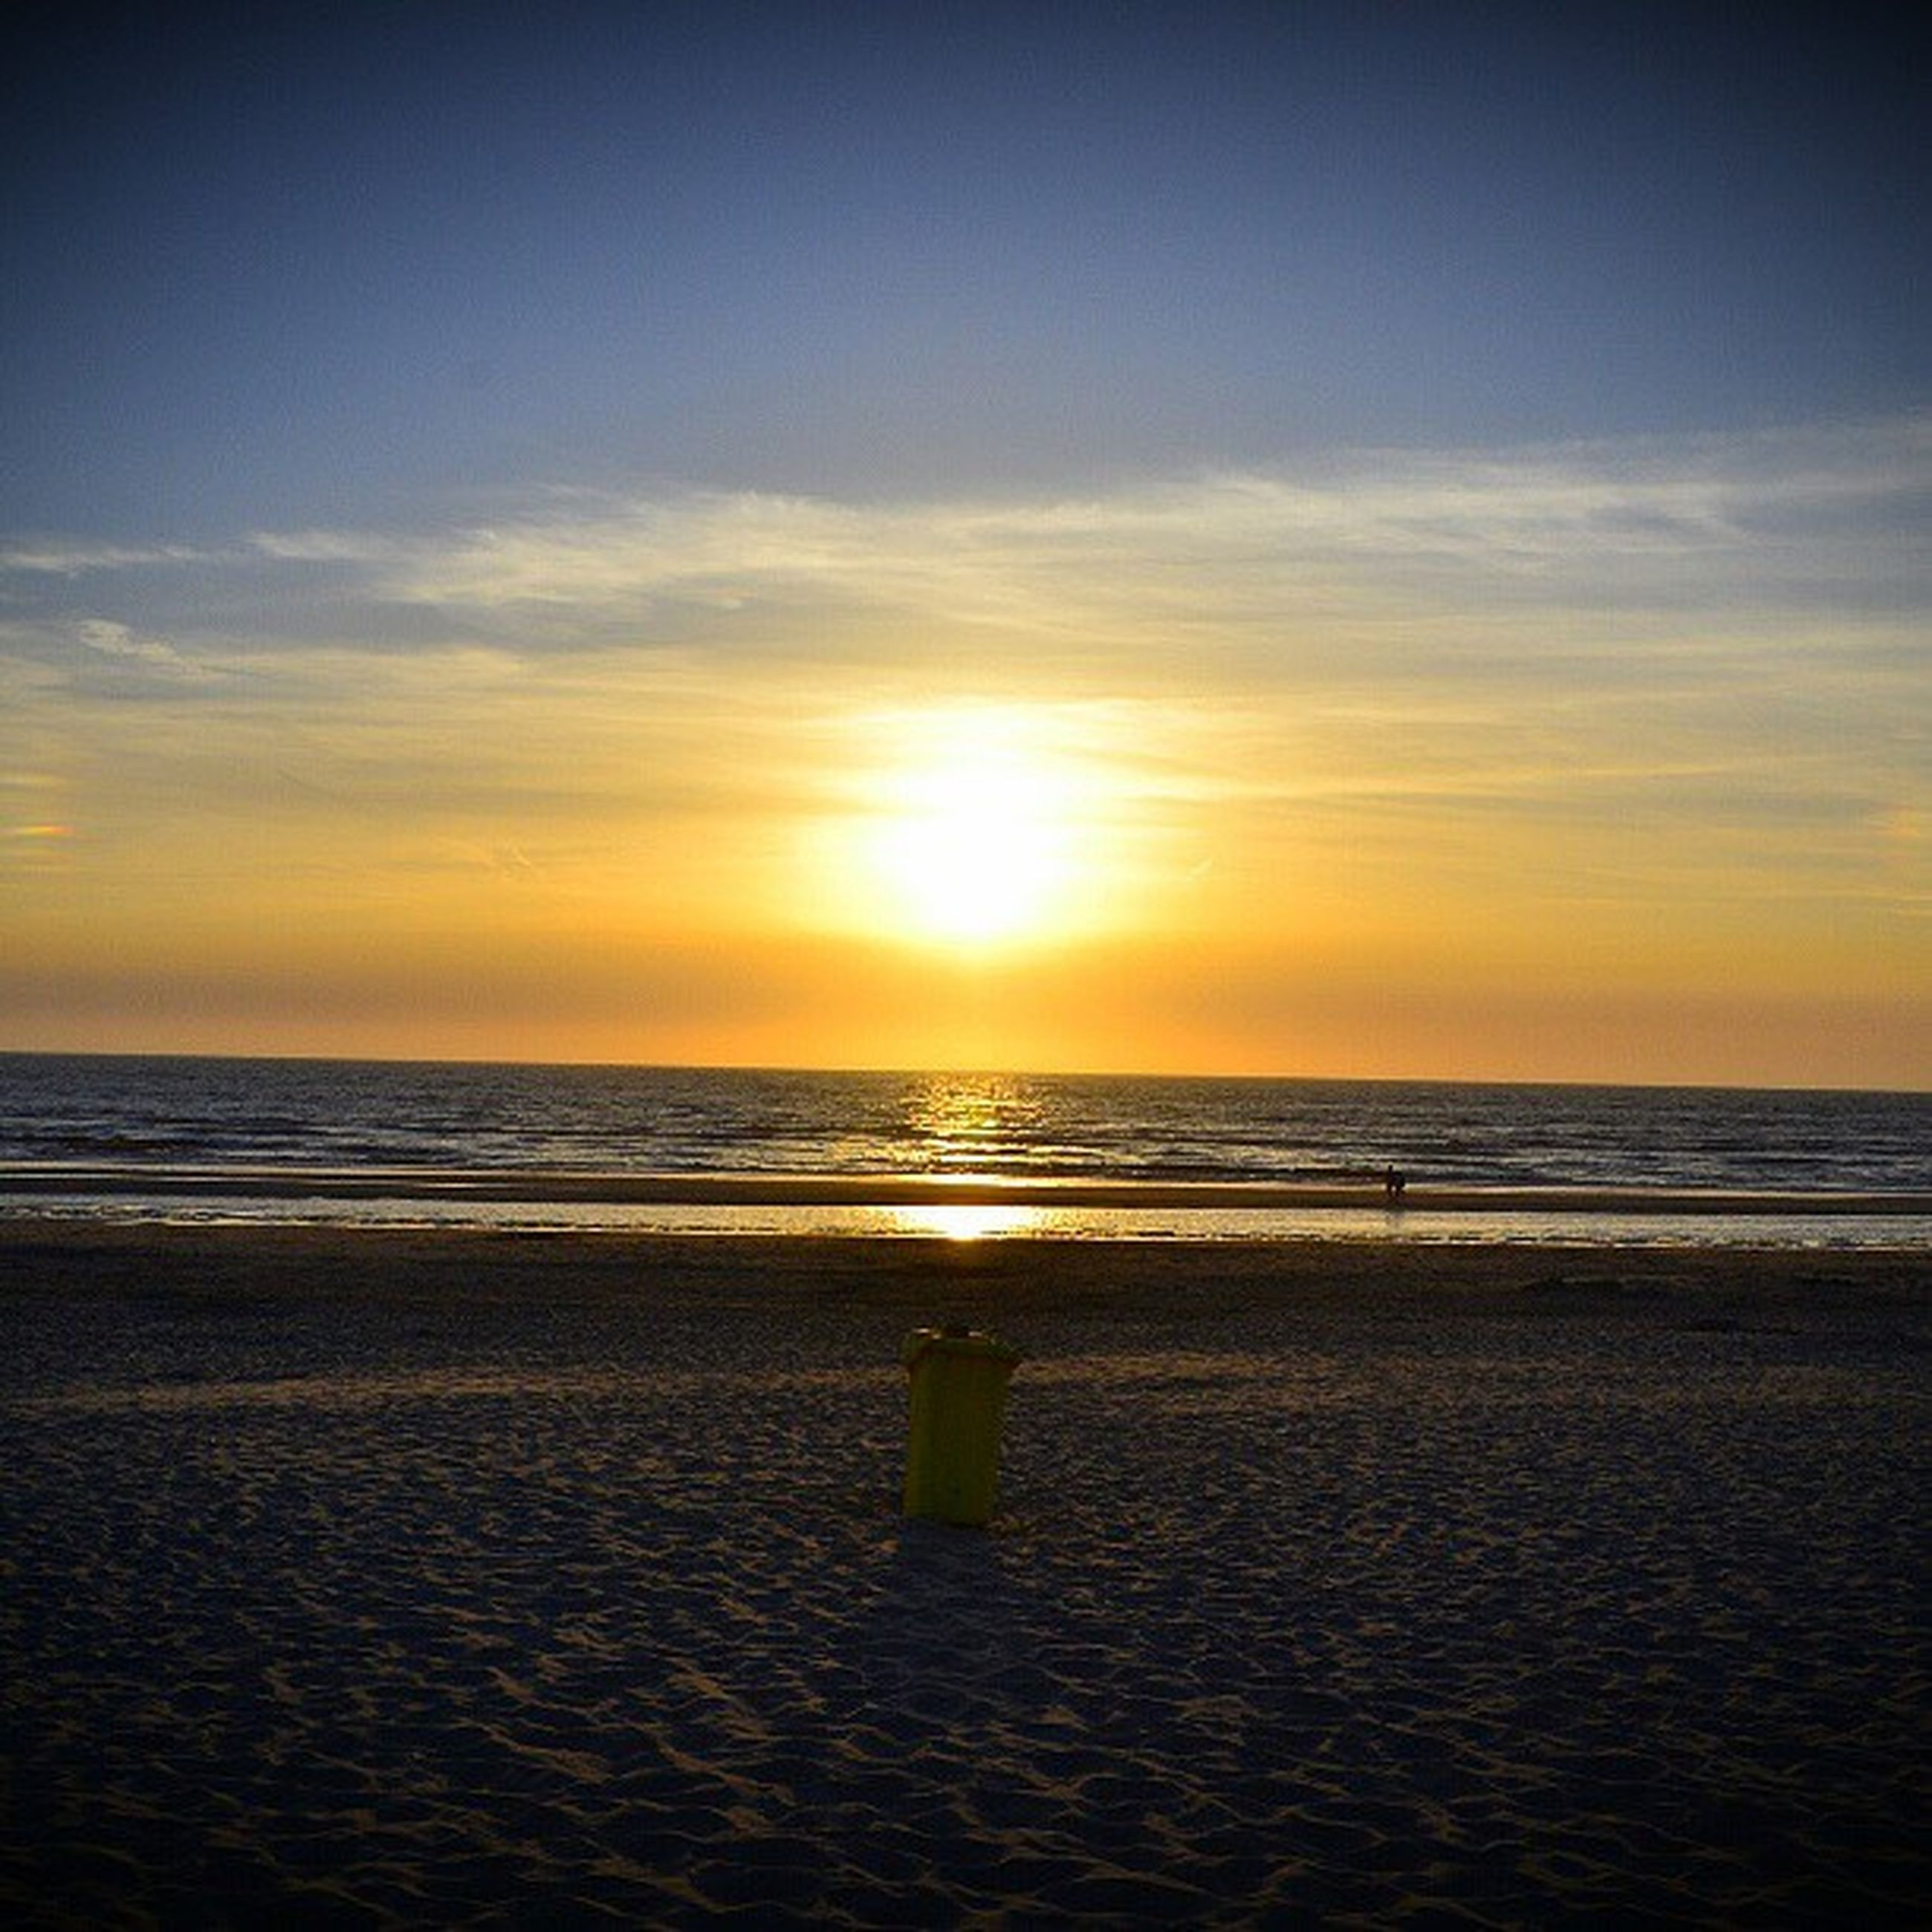 horizon over water, sea, beach, sunset, shore, water, scenics, sun, sky, tranquil scene, beauty in nature, orange color, tranquility, sand, idyllic, wave, nature, cloud - sky, sunlight, cloud